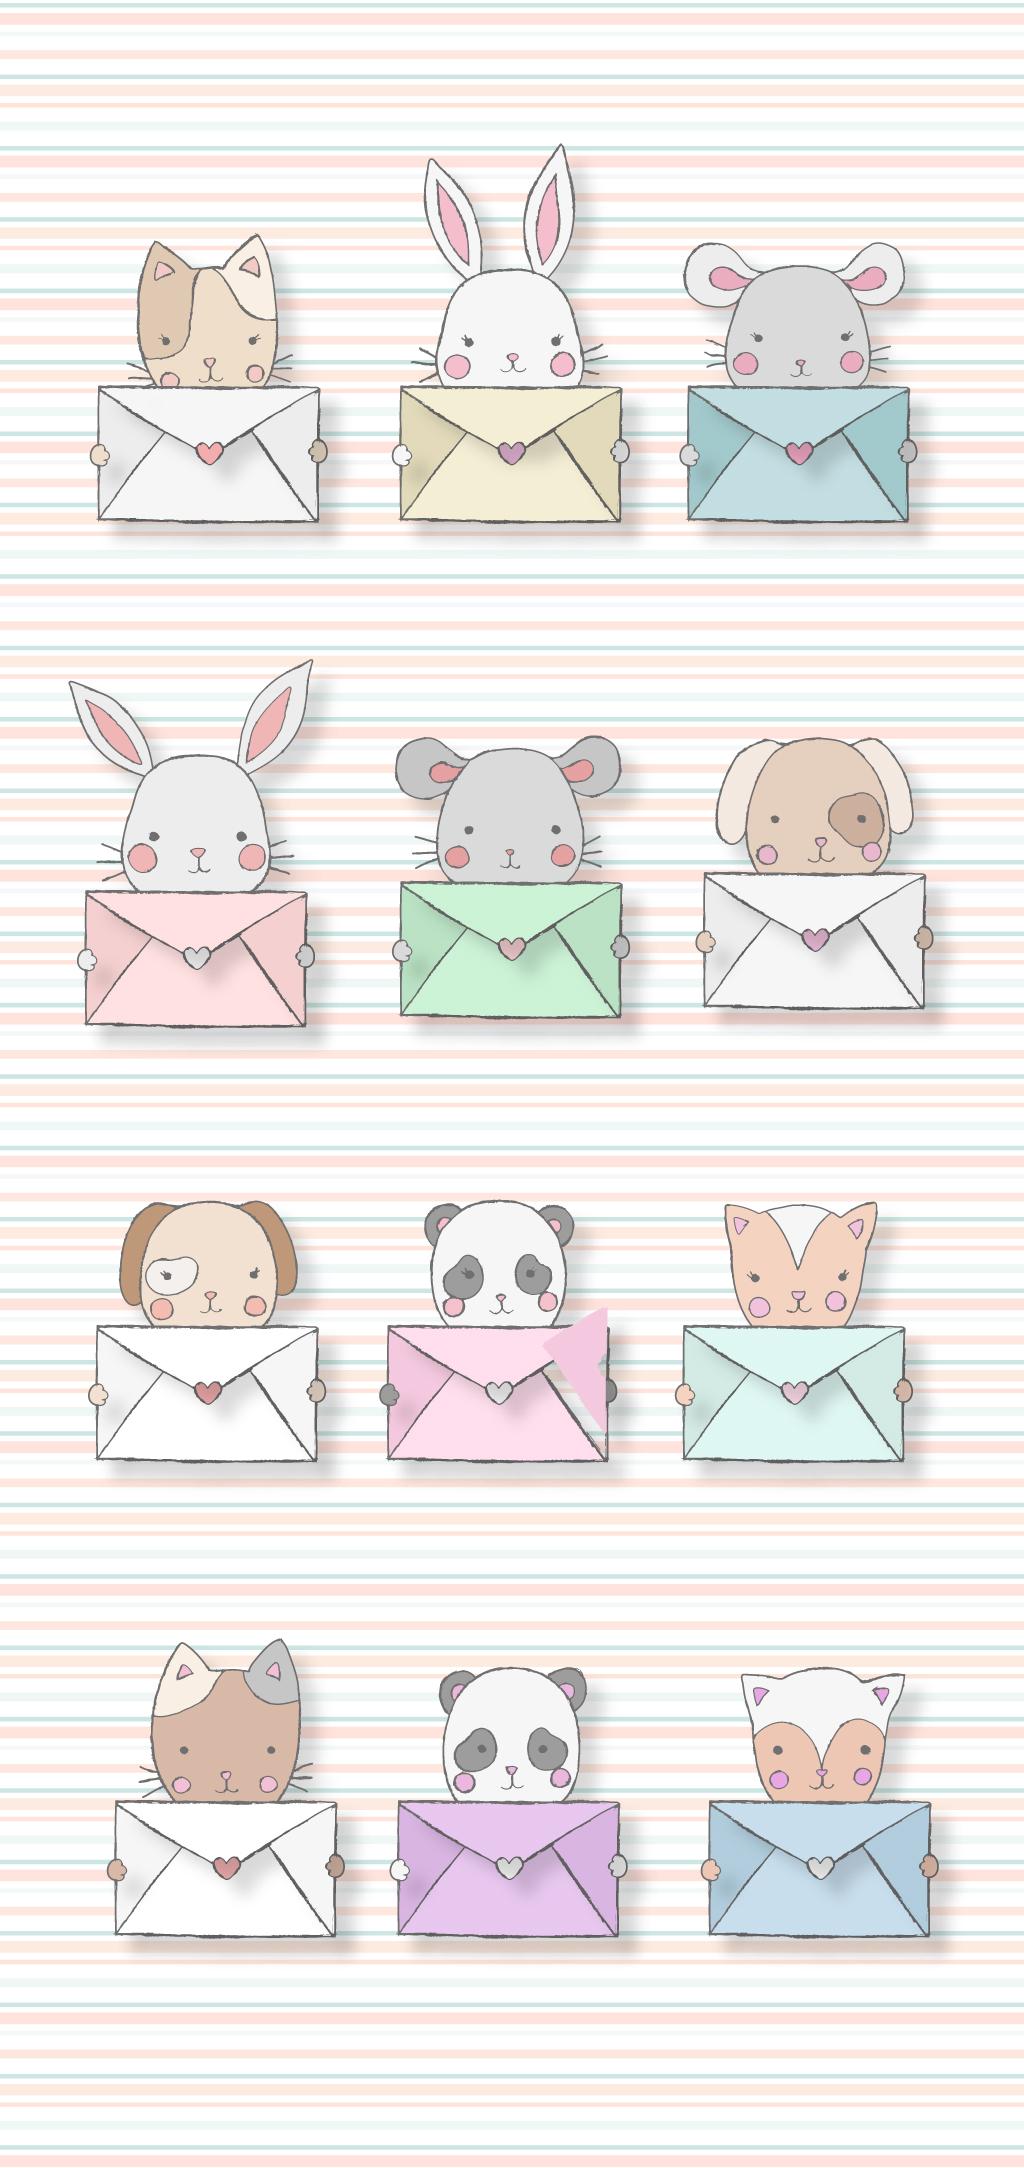 q版造型耗子手绘插画信封小动物兔子猫图片素材_q版小